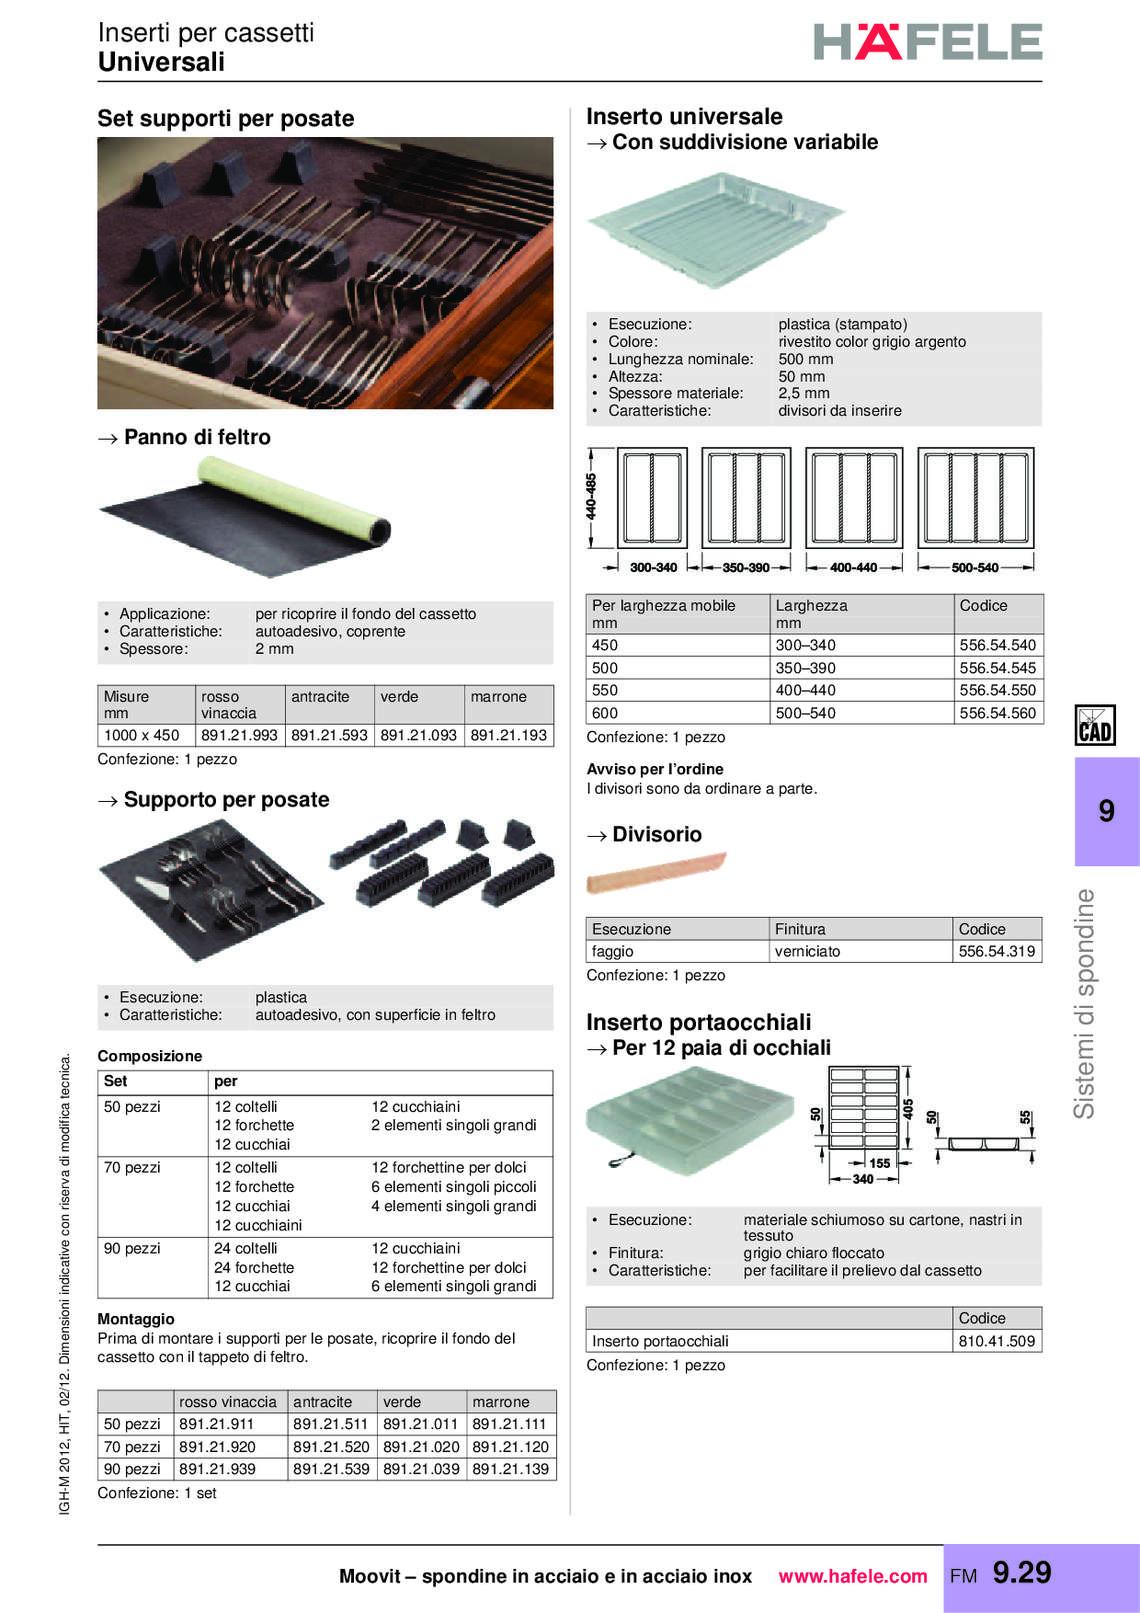 hafele-spondine-e-guide-per-mobili_40_042.jpg